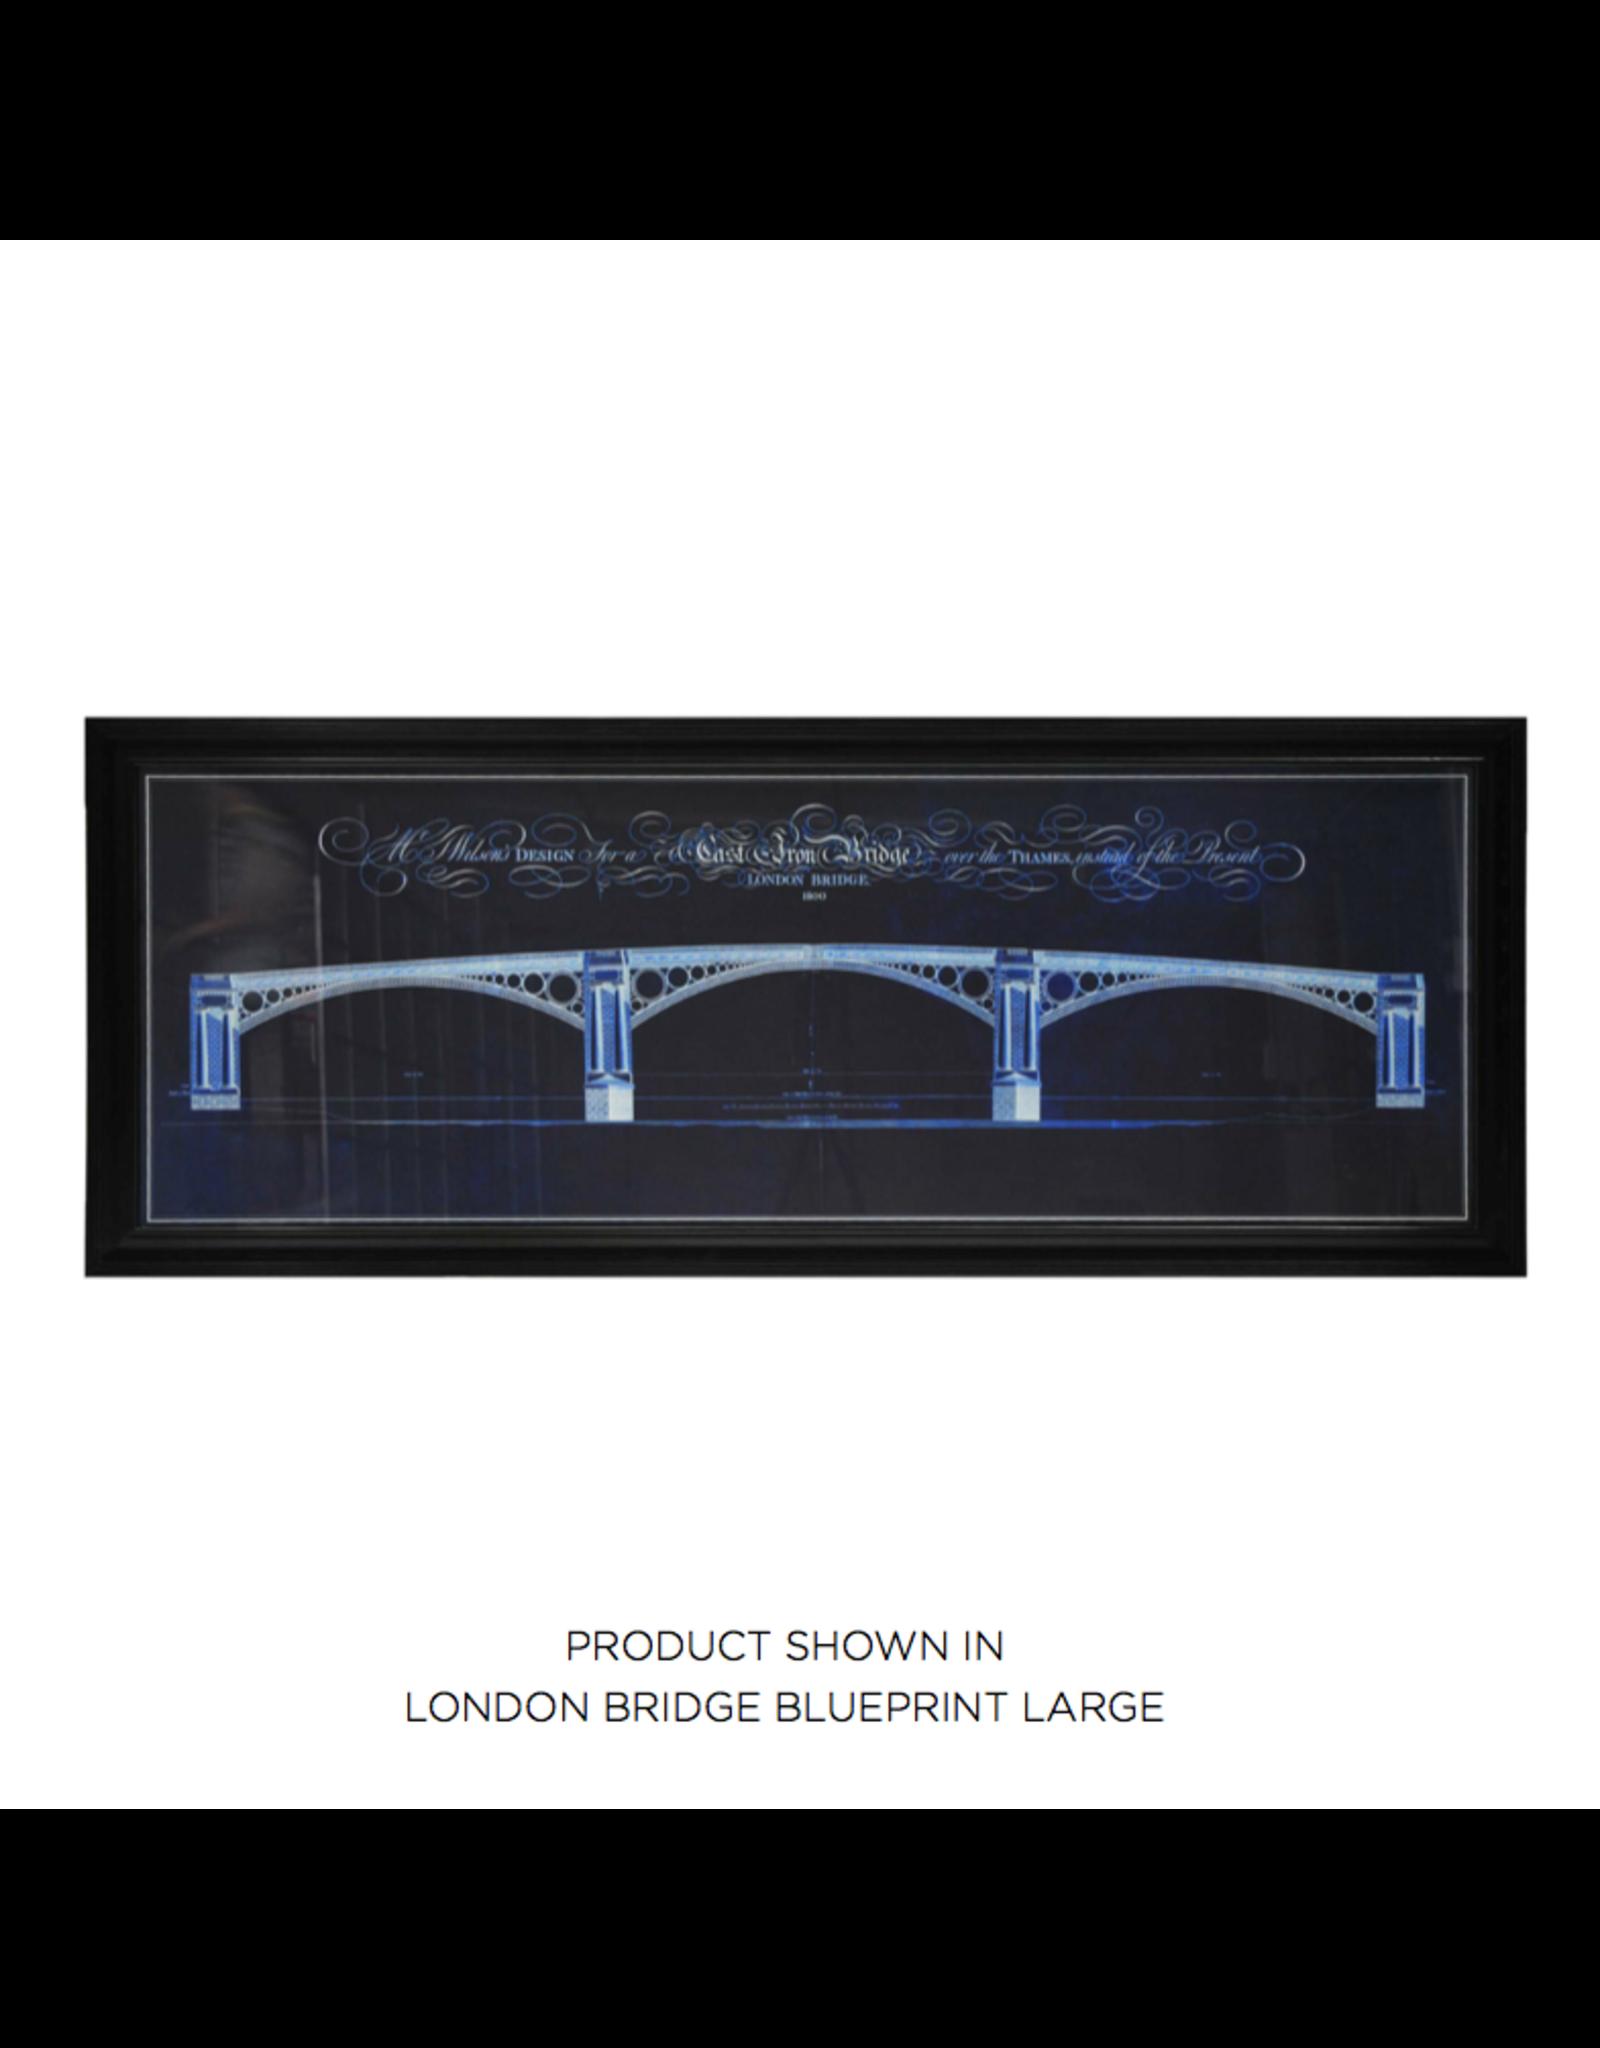 TIMOTHY OULTON ARCHTRL LONDON BRIDGE BLUEPRINT LARGE ART